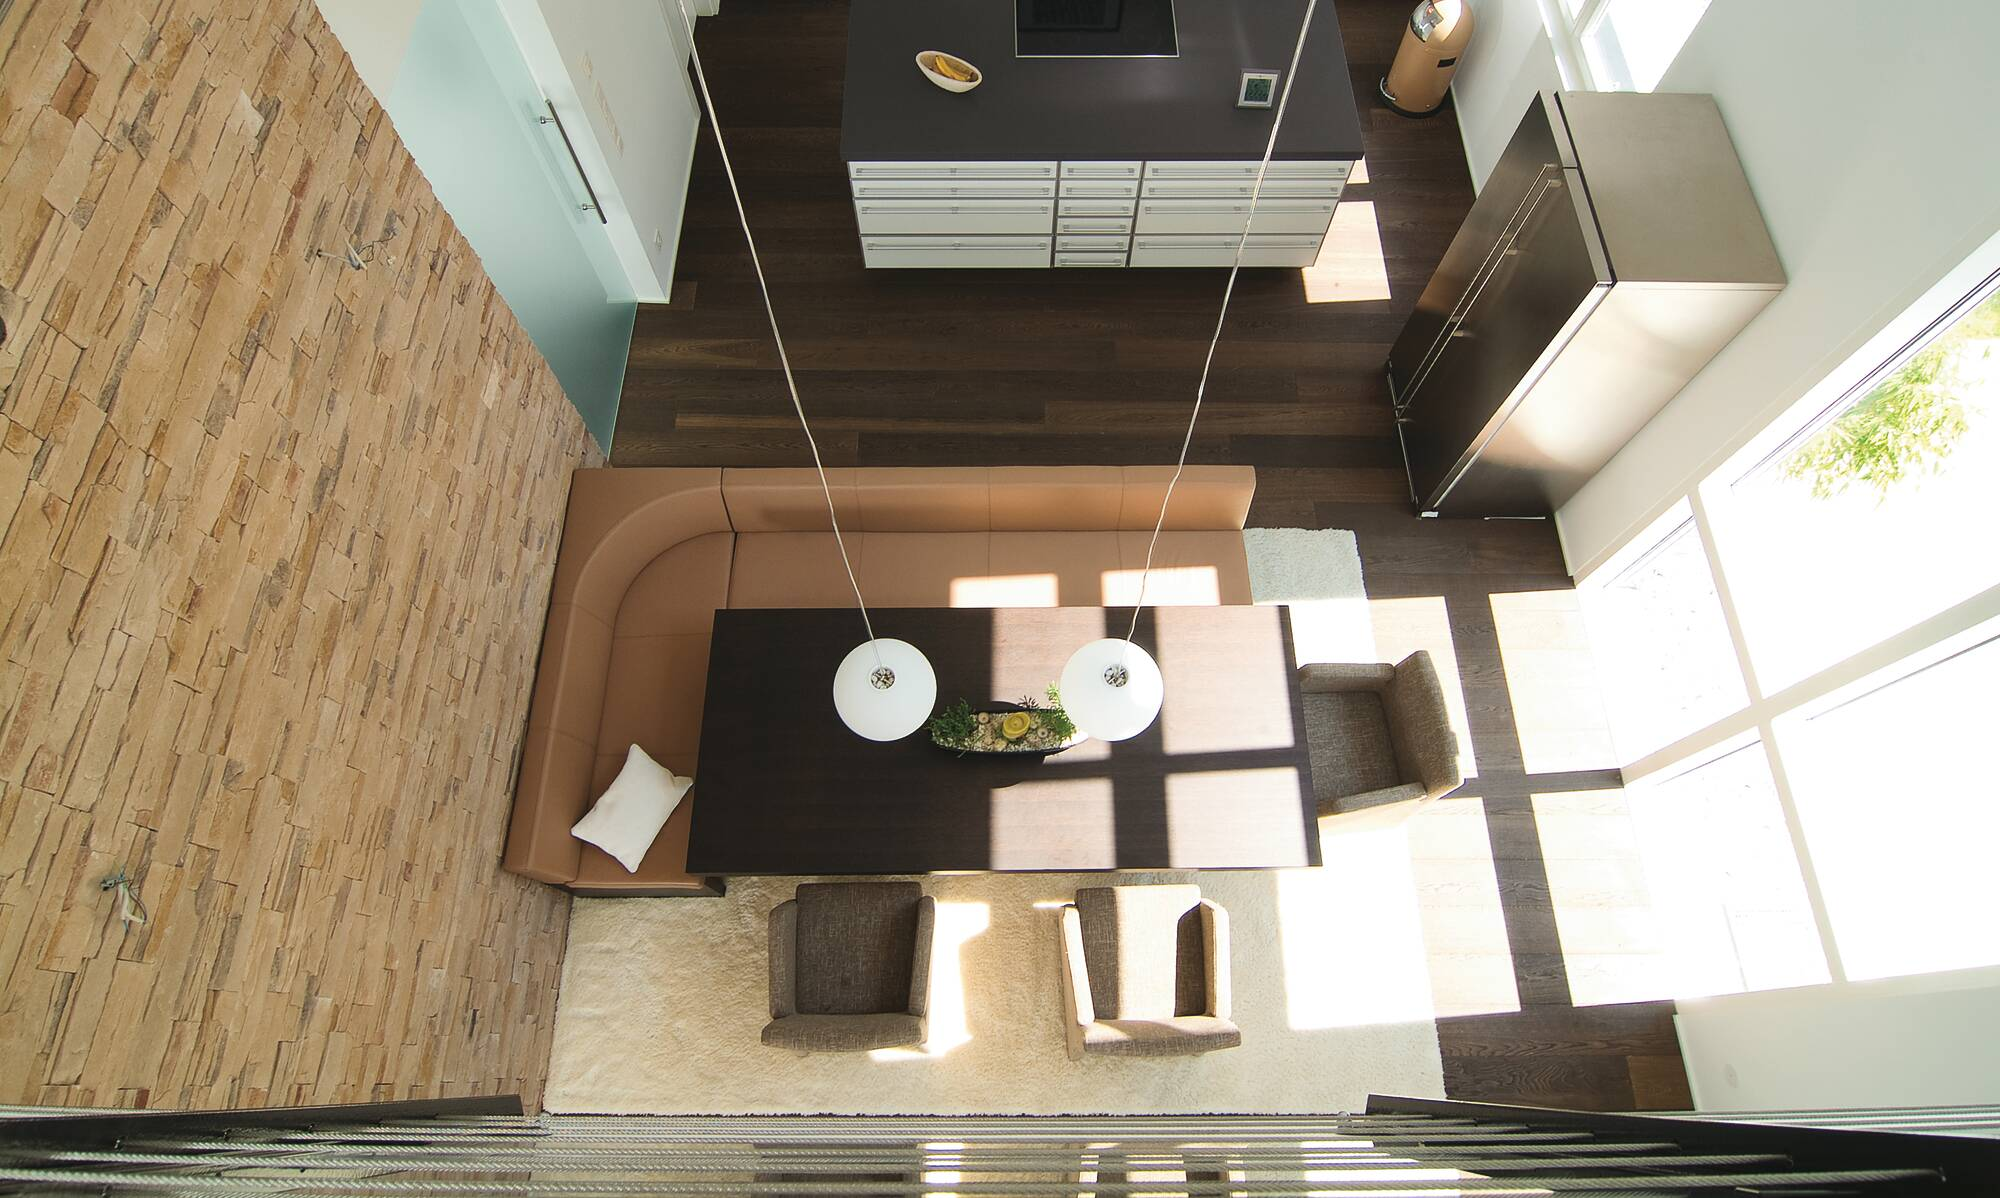 Luxury 3-storey prefab home